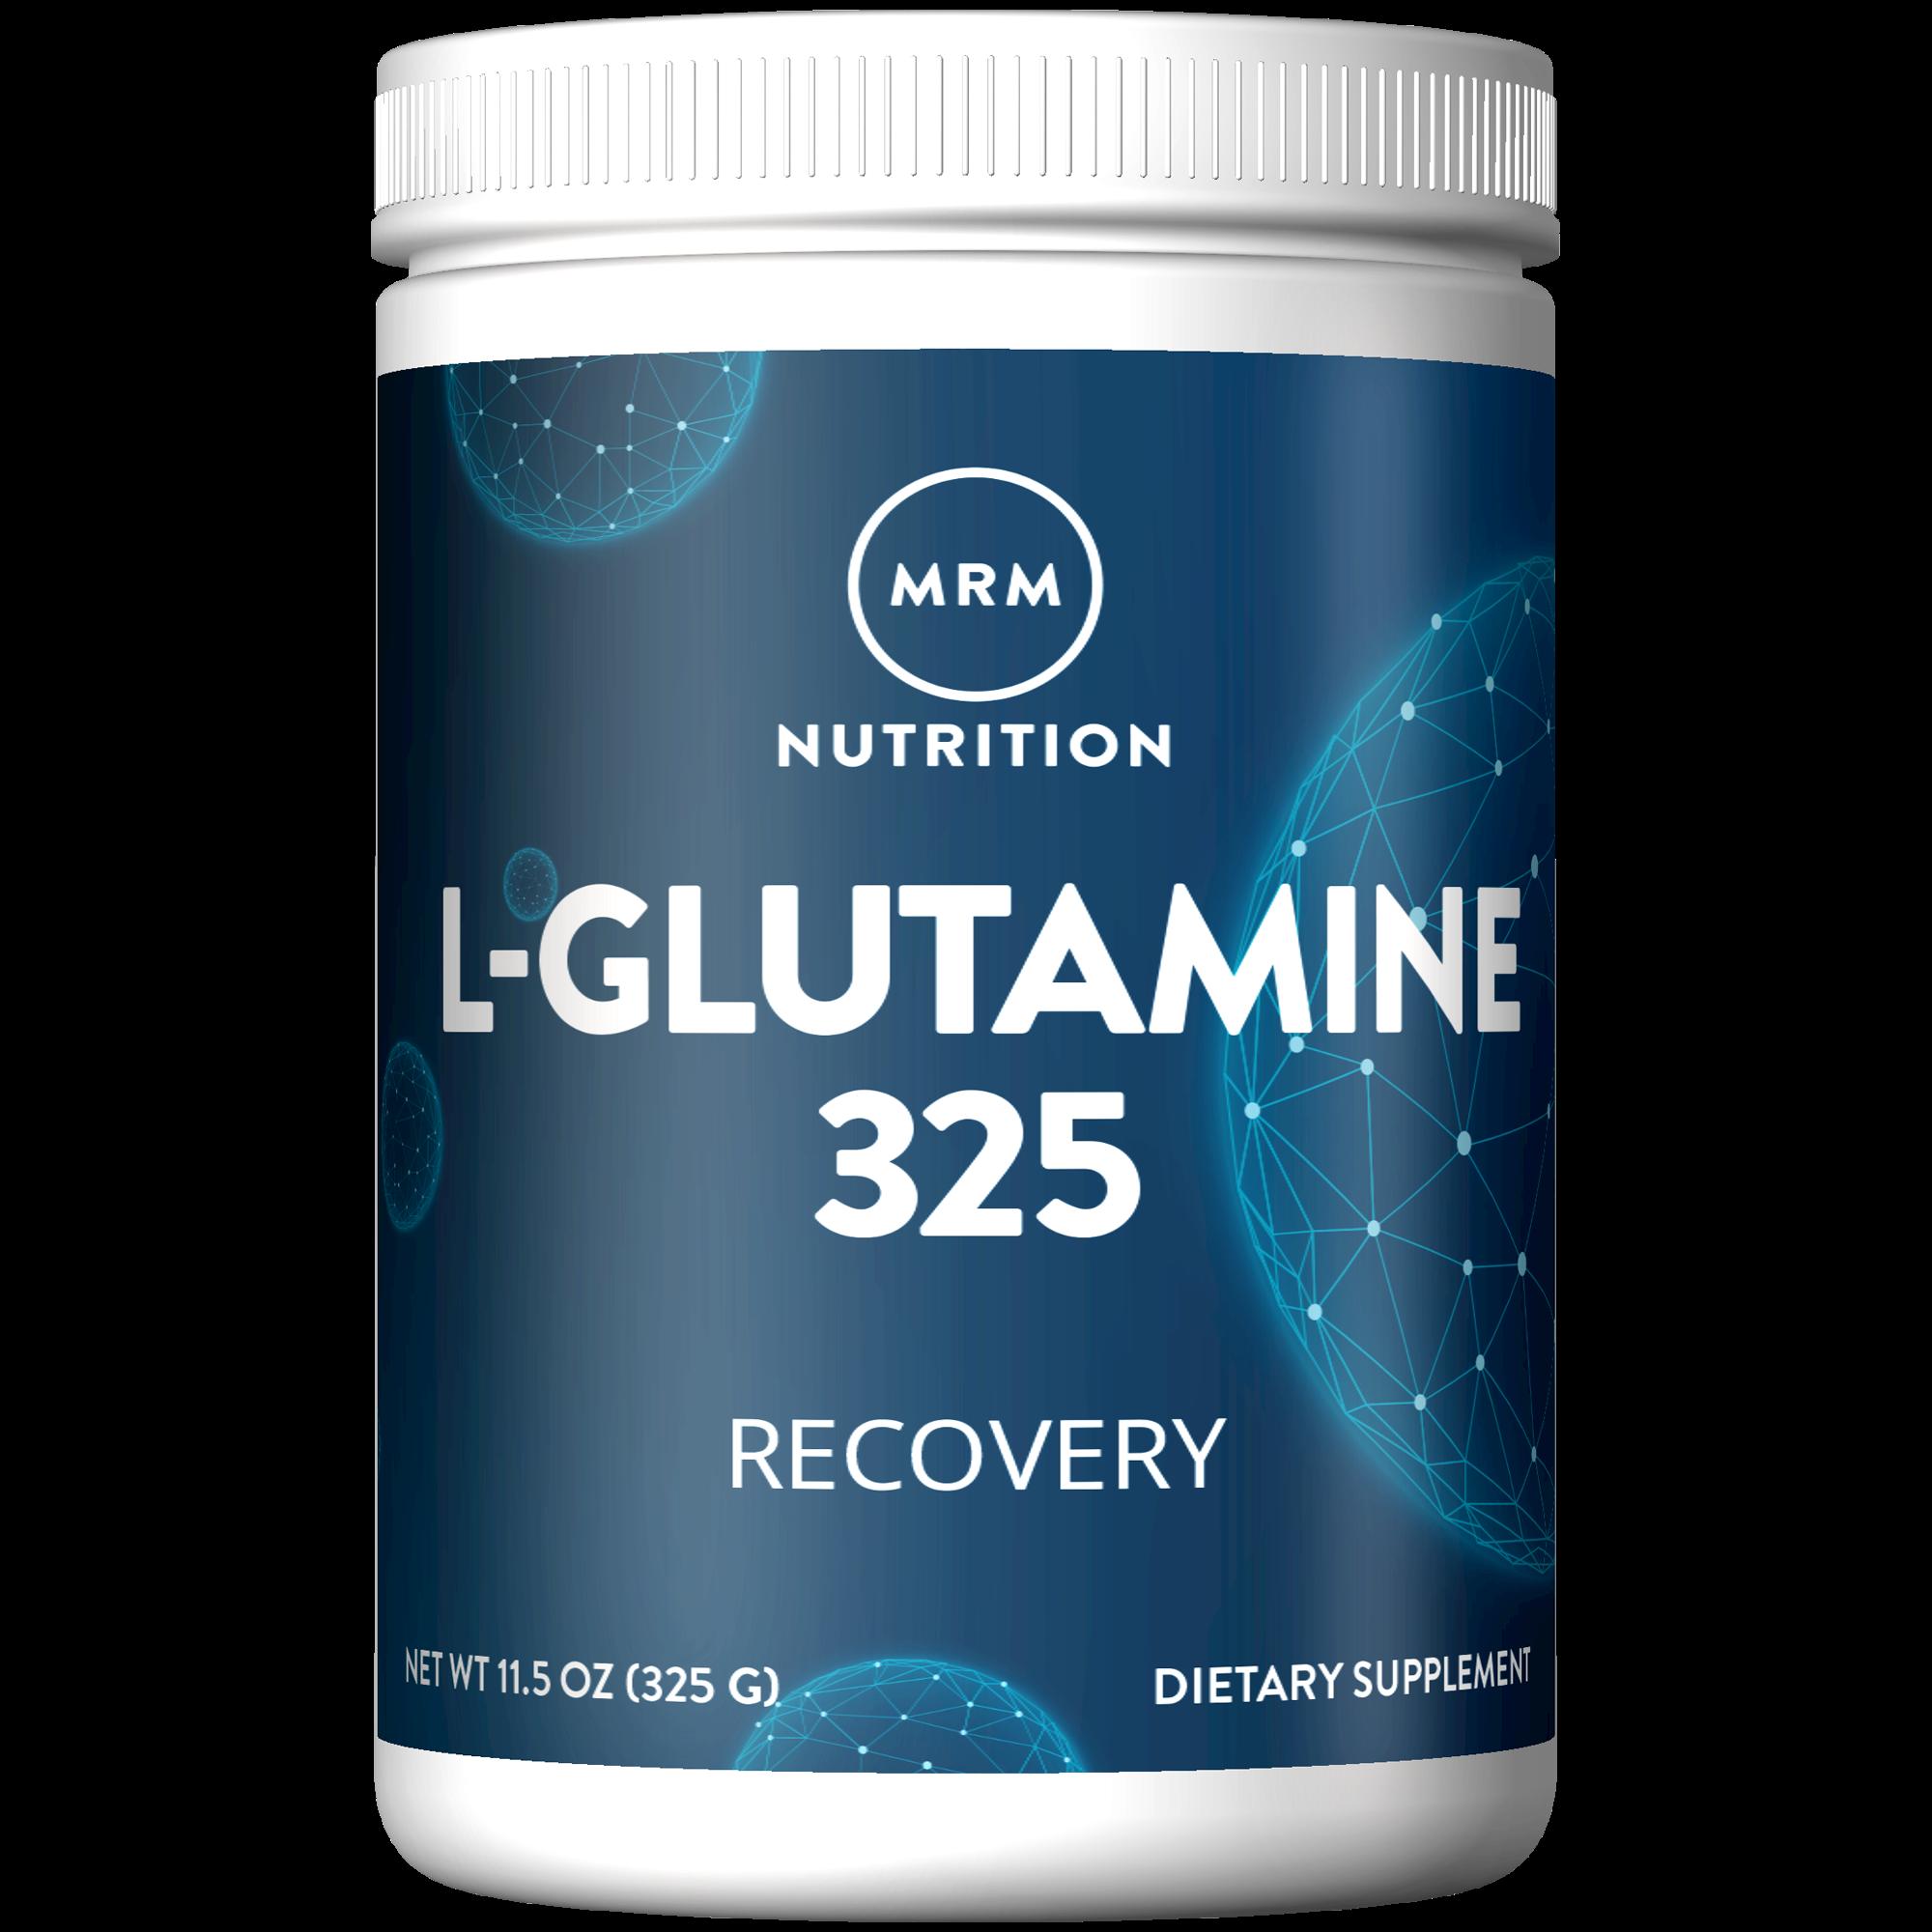 L-Glutamine Powder (MRM)